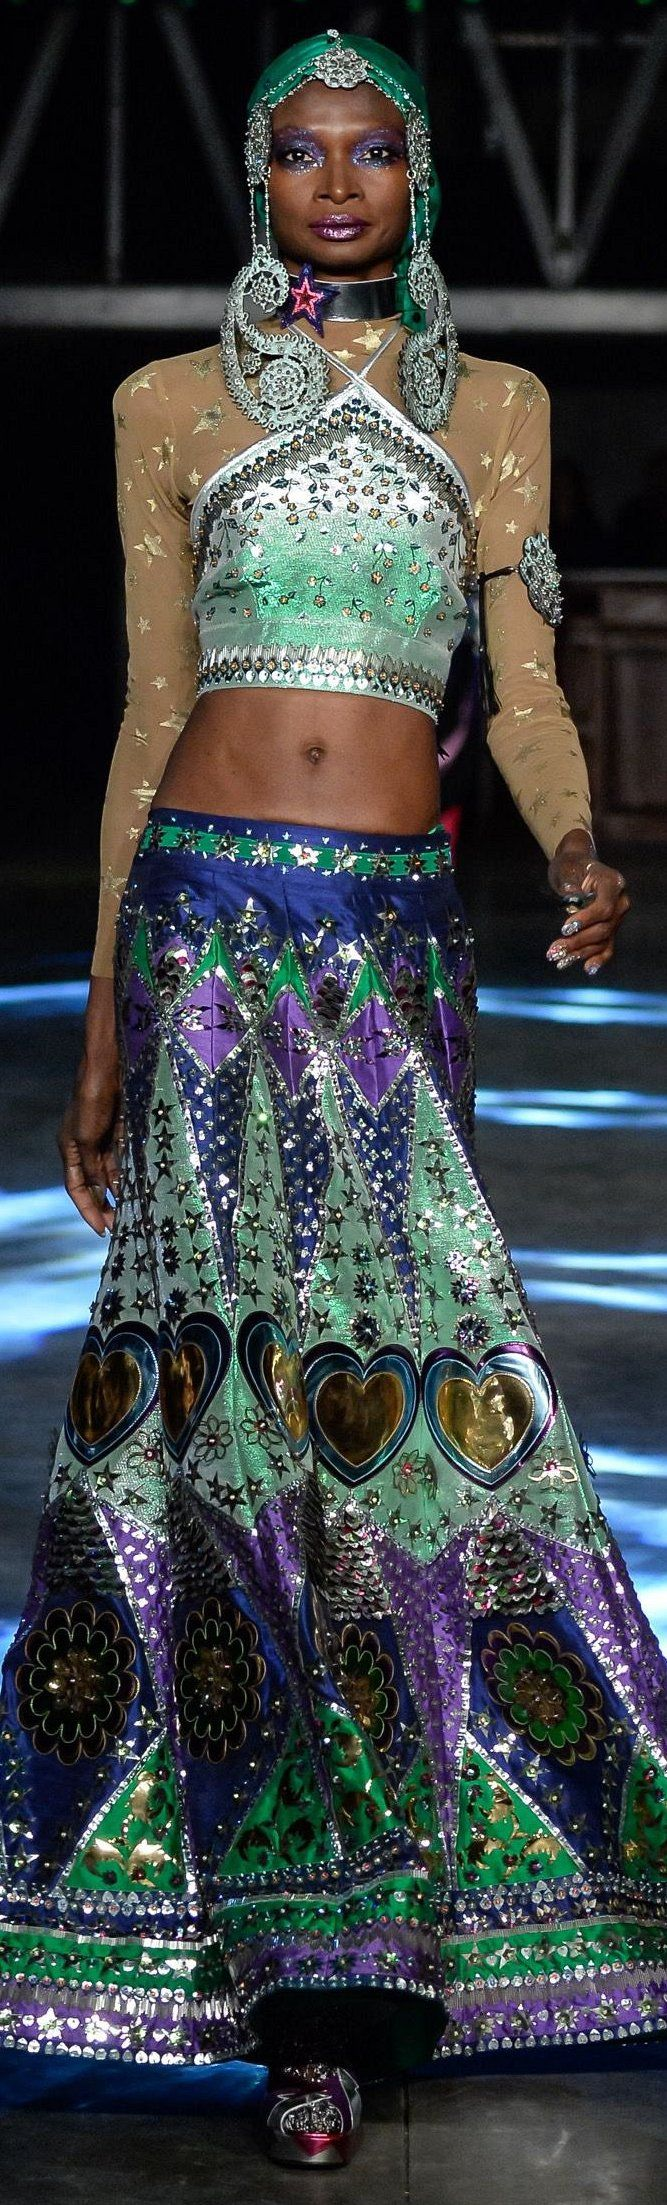 Manish Arora Indian Fashion Spring Summer 2016 ready-to-wear